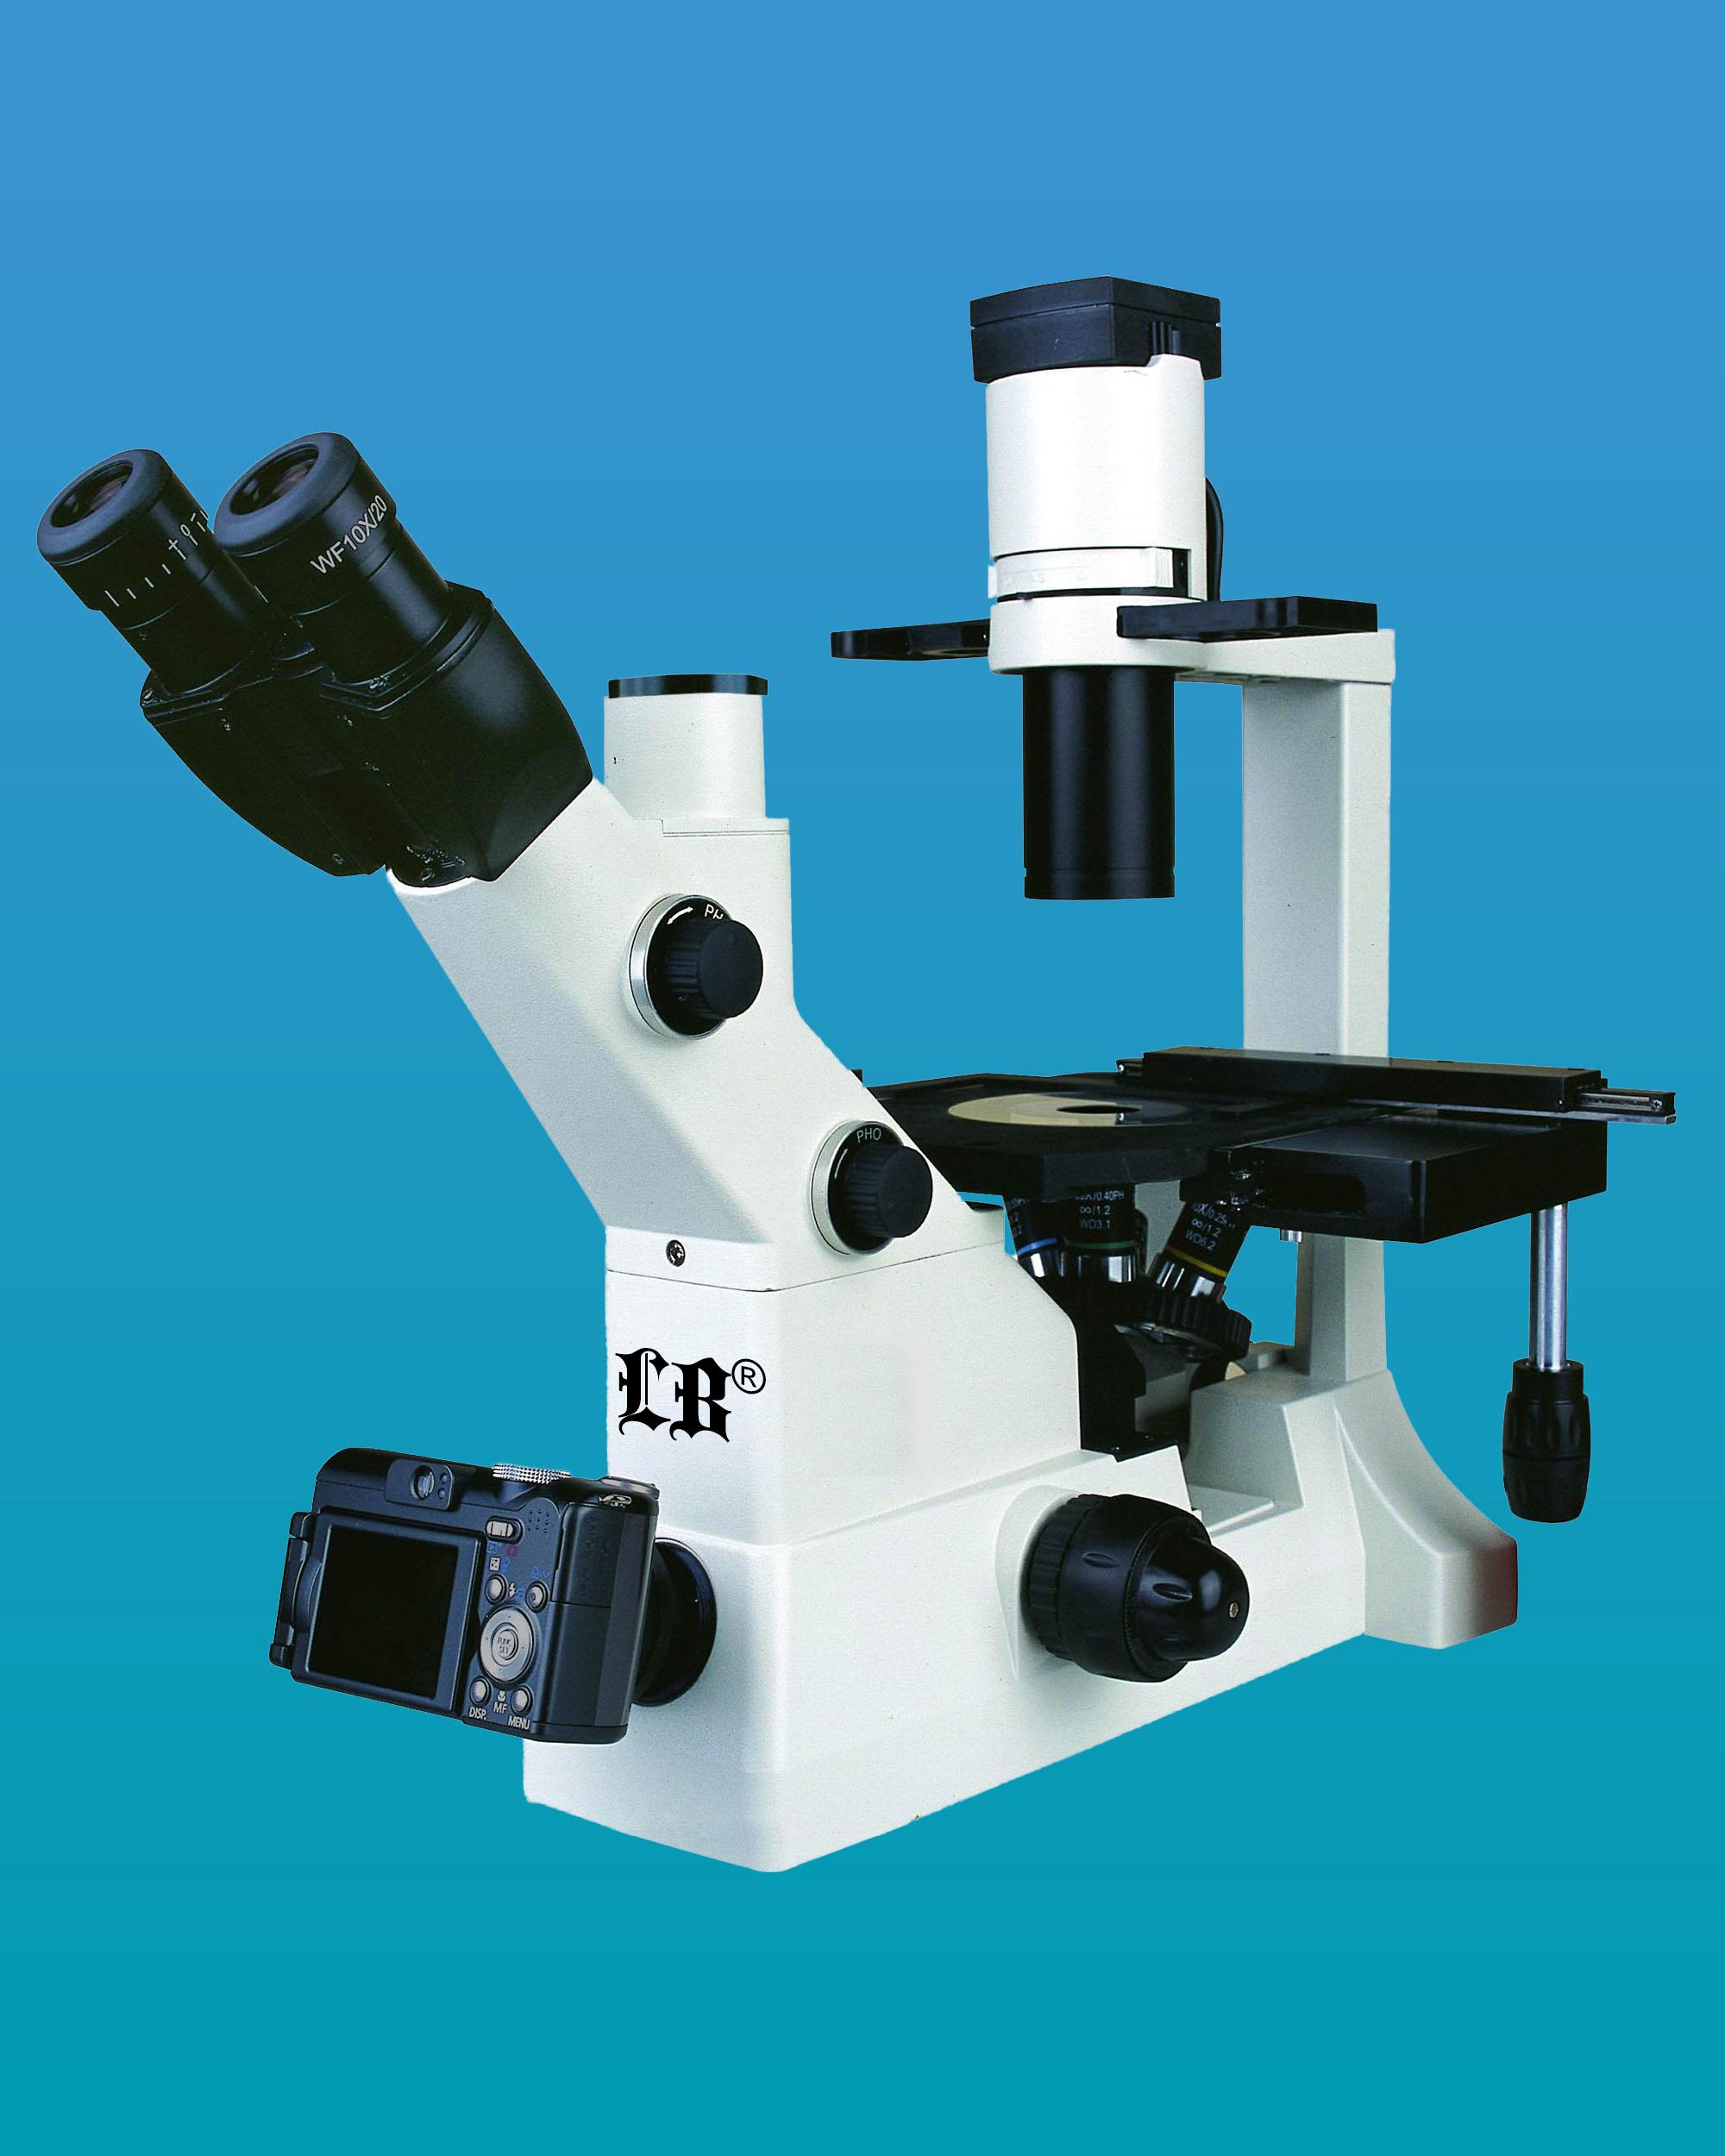 [LB-291] Inverted Trinocular Biological Microscope w/ Infinite Optical System